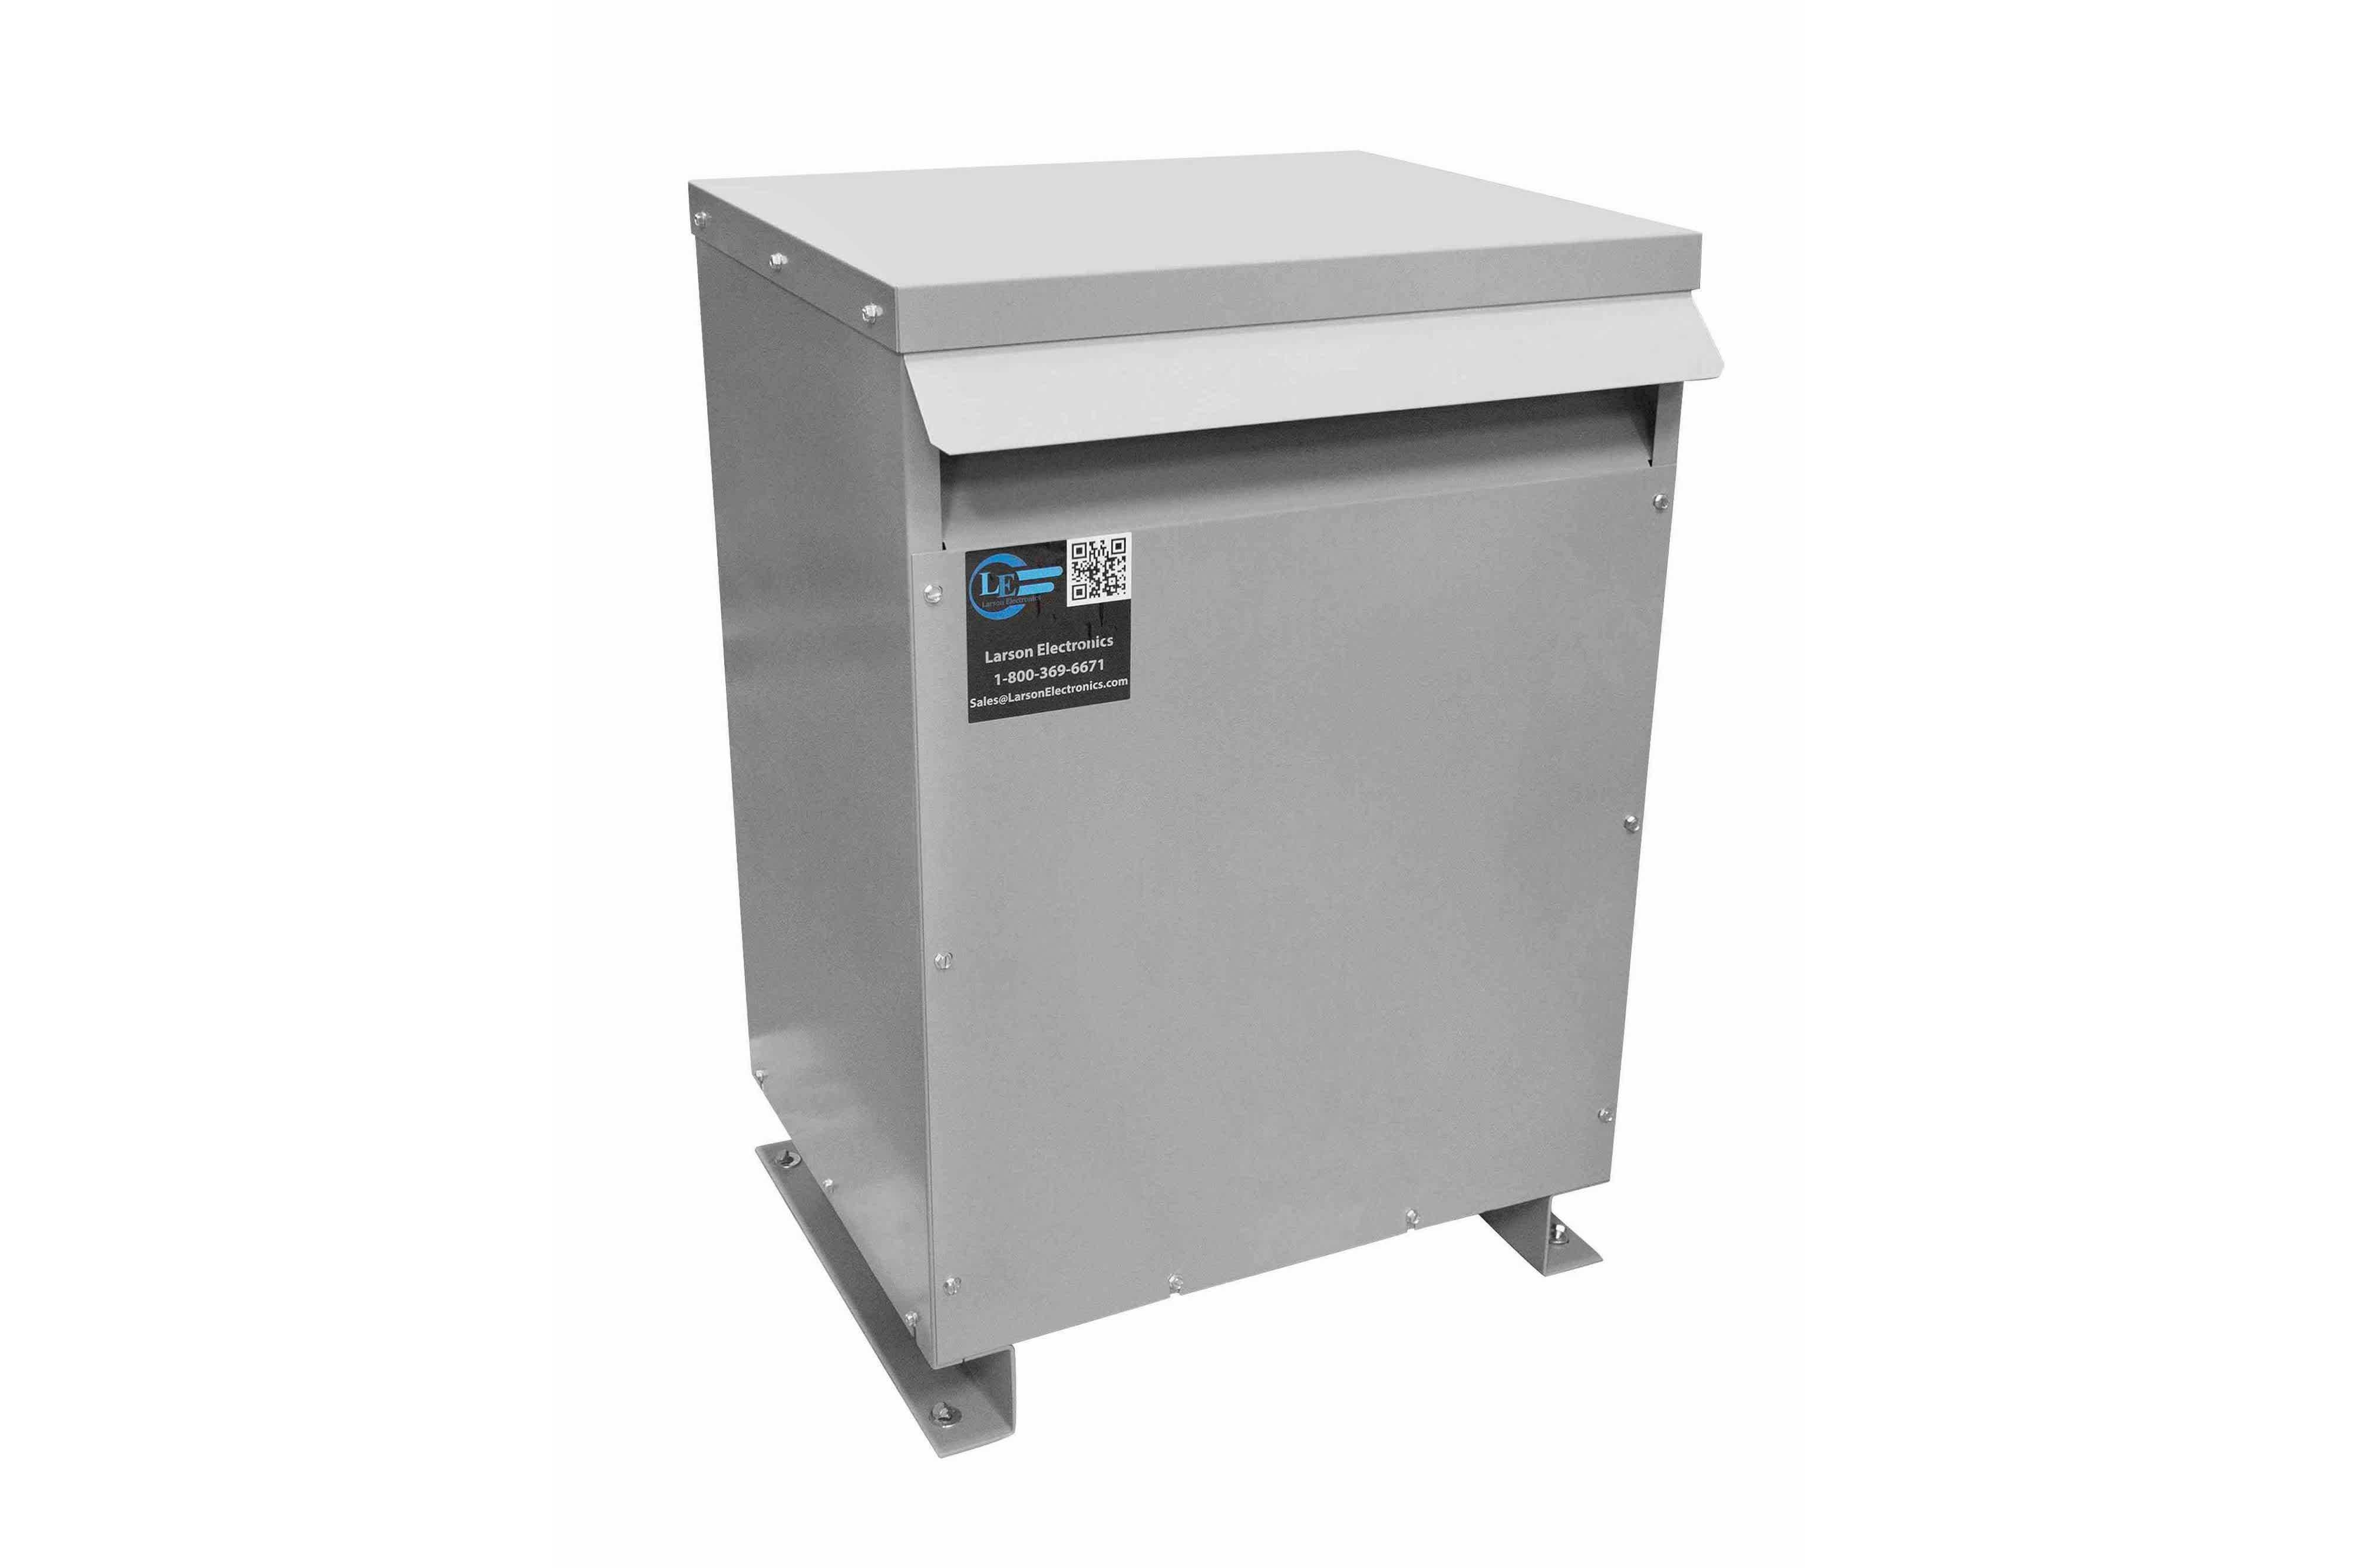 60 kVA 3PH Isolation Transformer, 480V Wye Primary, 480Y/277 Wye-N Secondary, N3R, Ventilated, 60 Hz